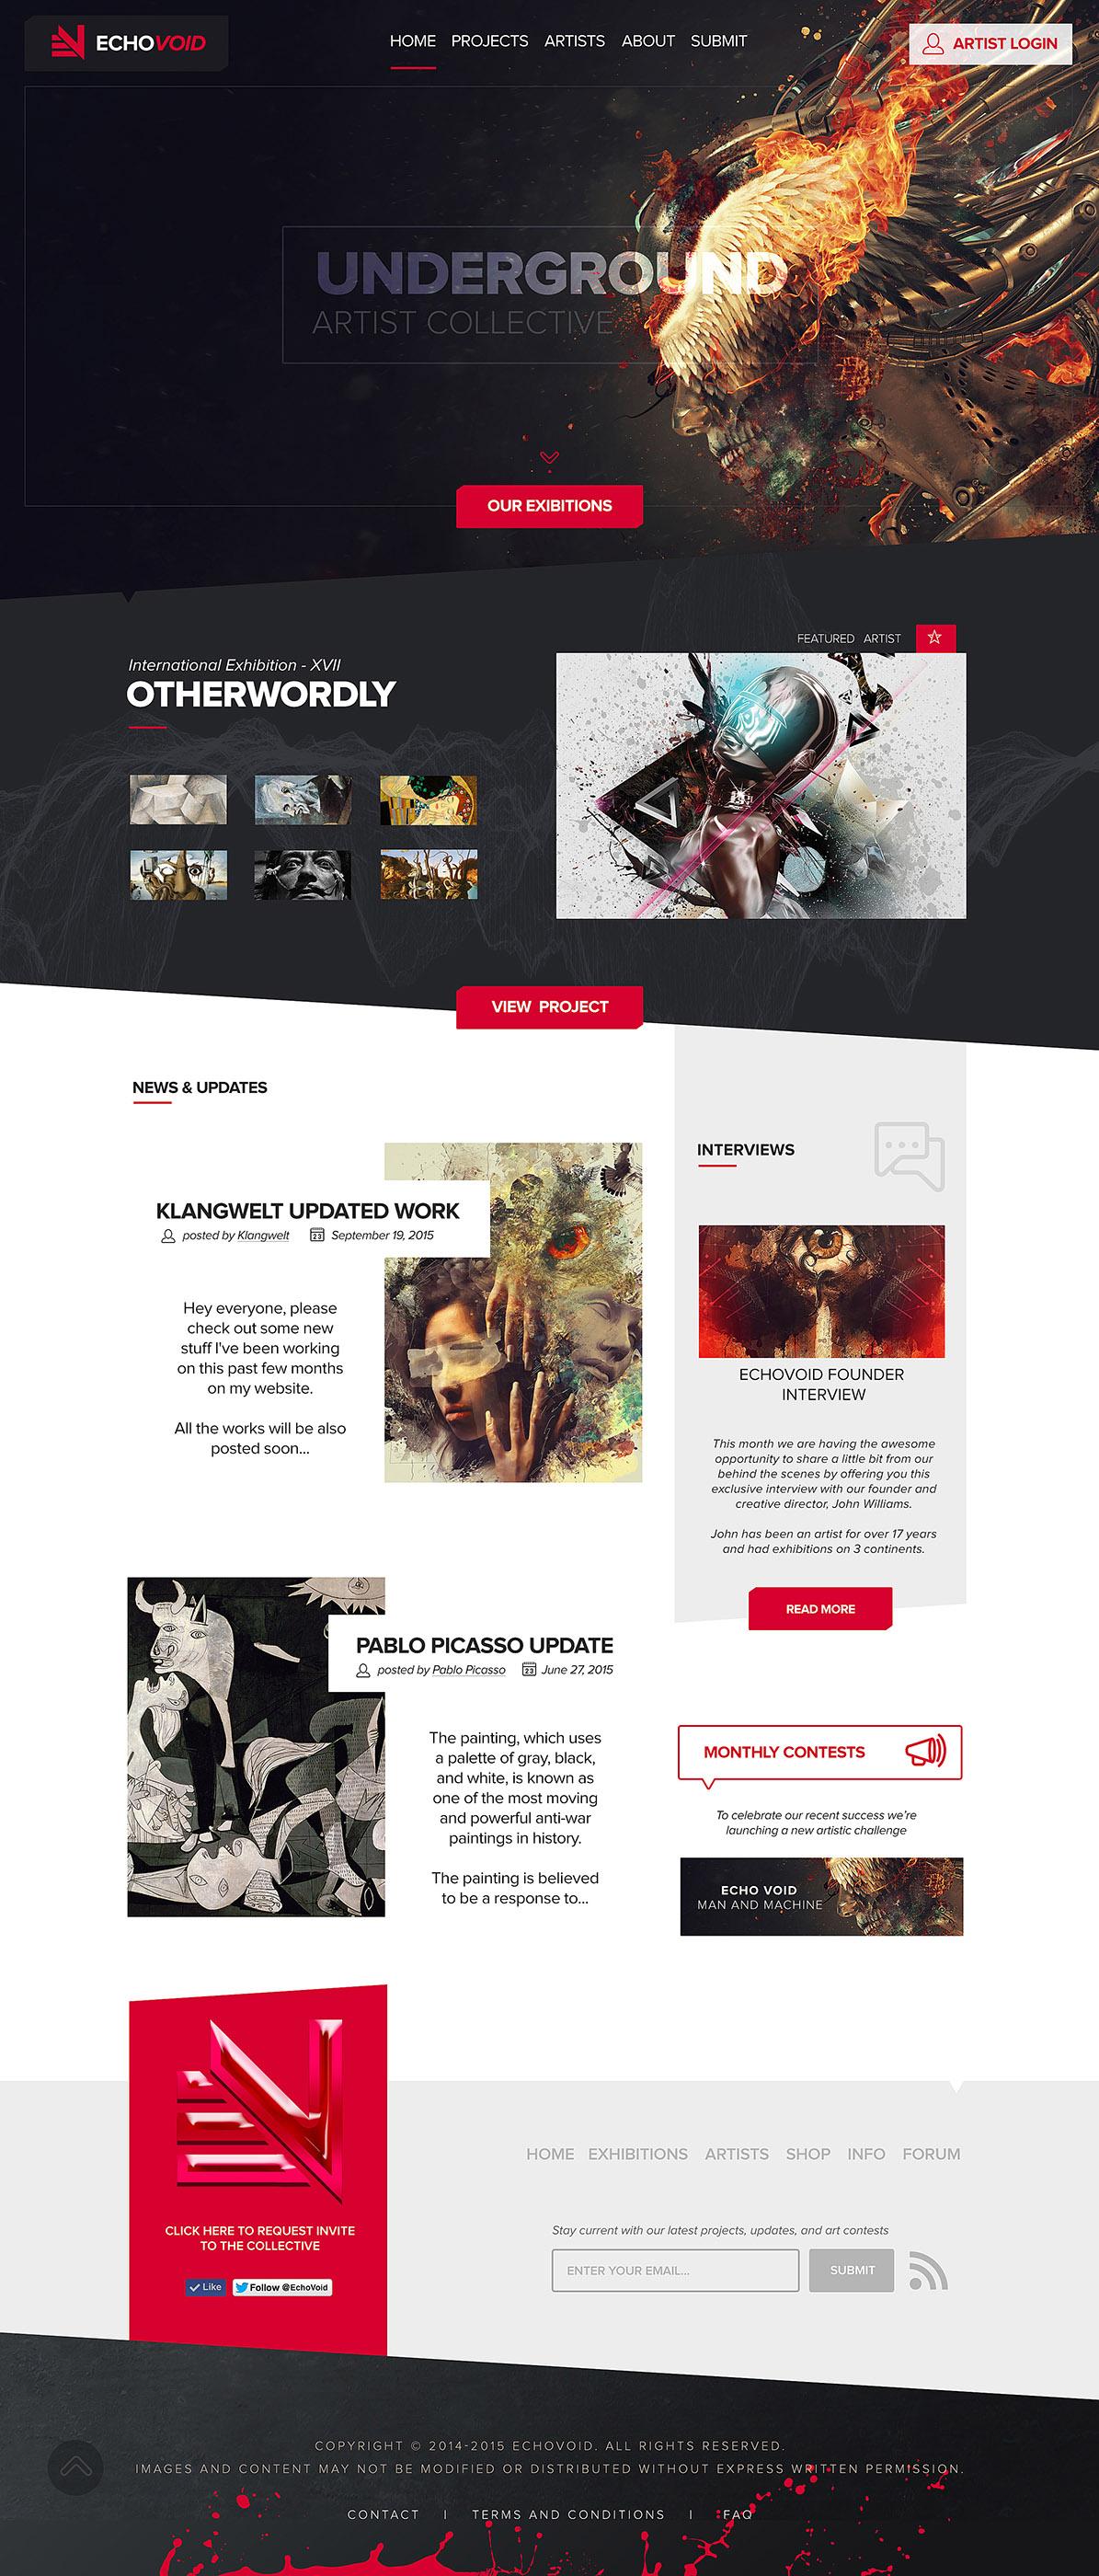 EchoVoid Artist Community Homepage